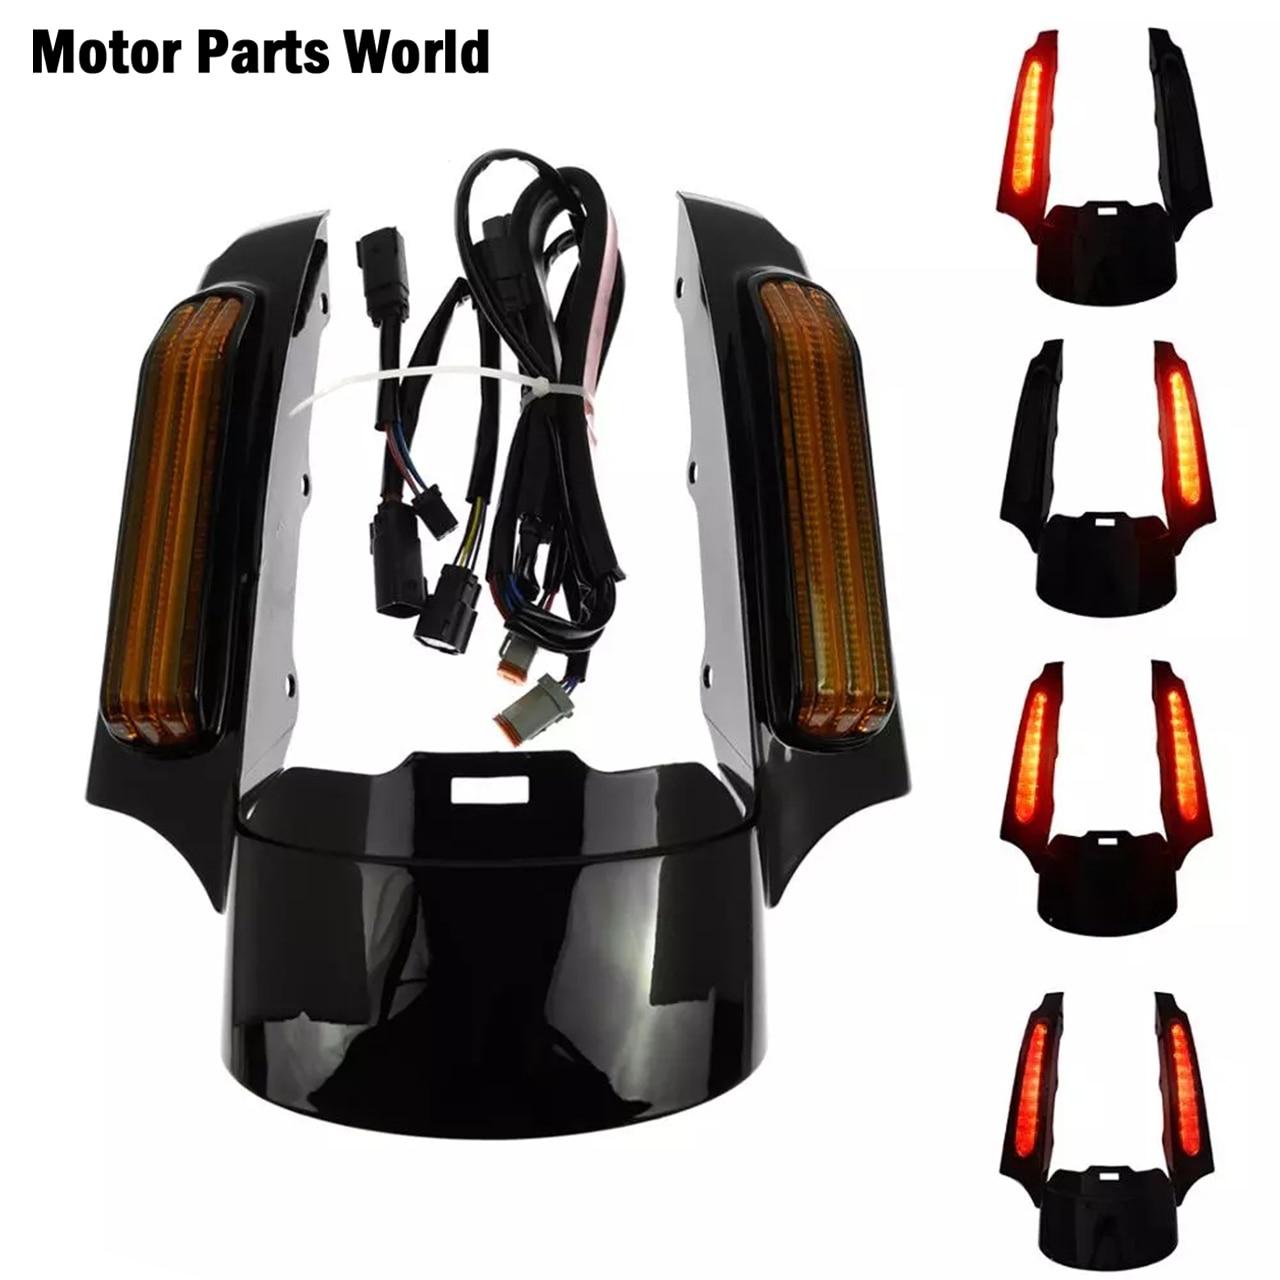 Luz LED trasera para motocicleta, conjunto de fascia negro brillante para Harley Touring Road Glide Electra Glide Road King CVO 2009-2013